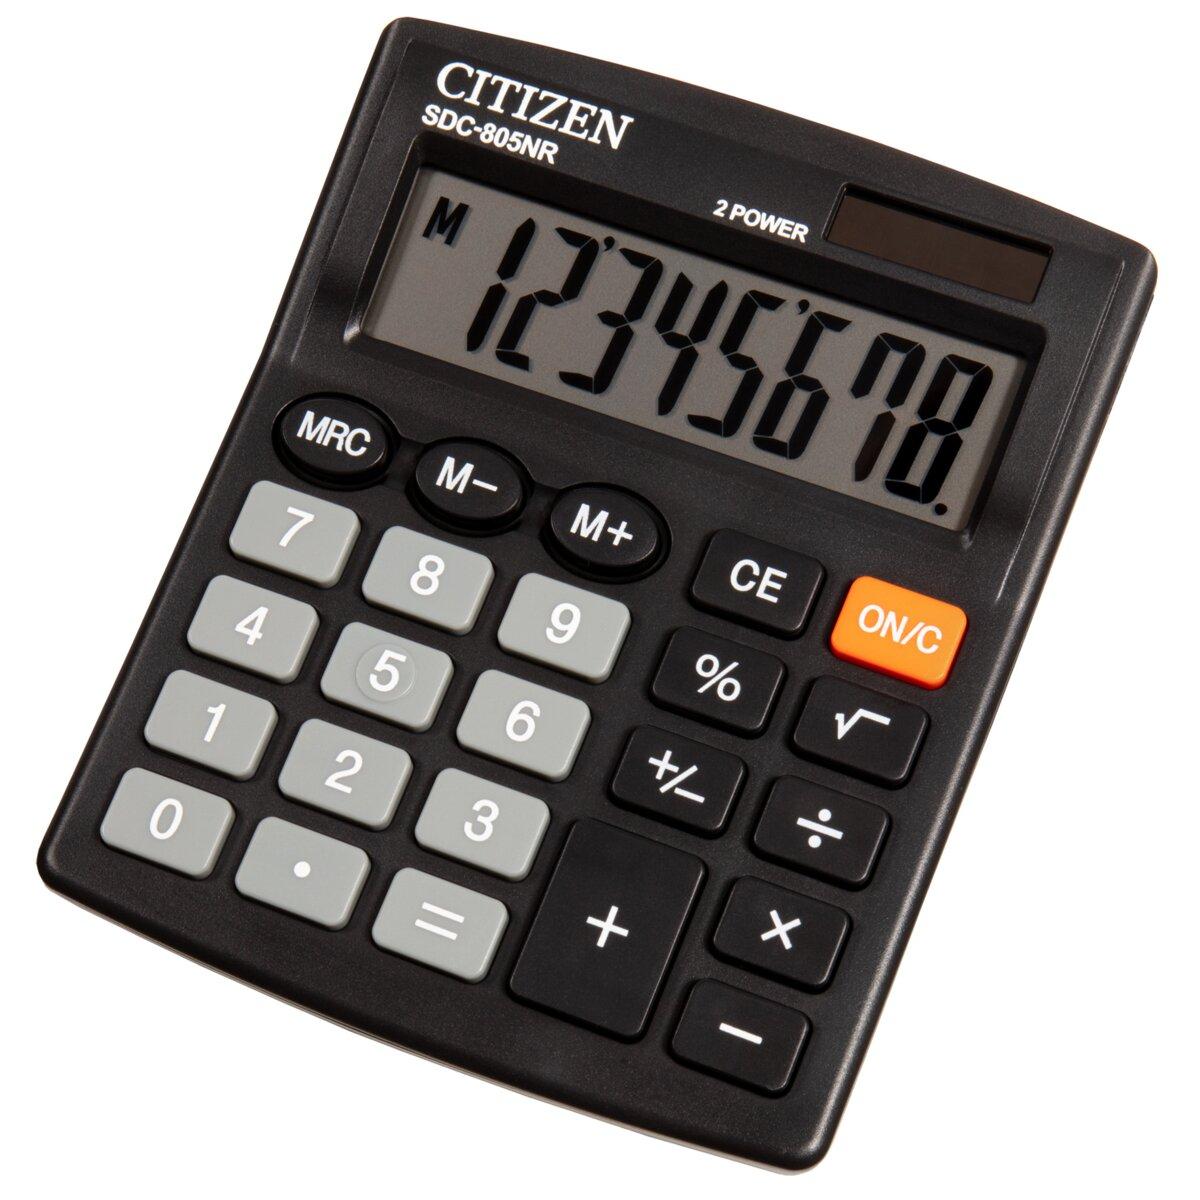 CITIZEN SDC-805NR Kalkulator - ceny i opinie w Media Expert